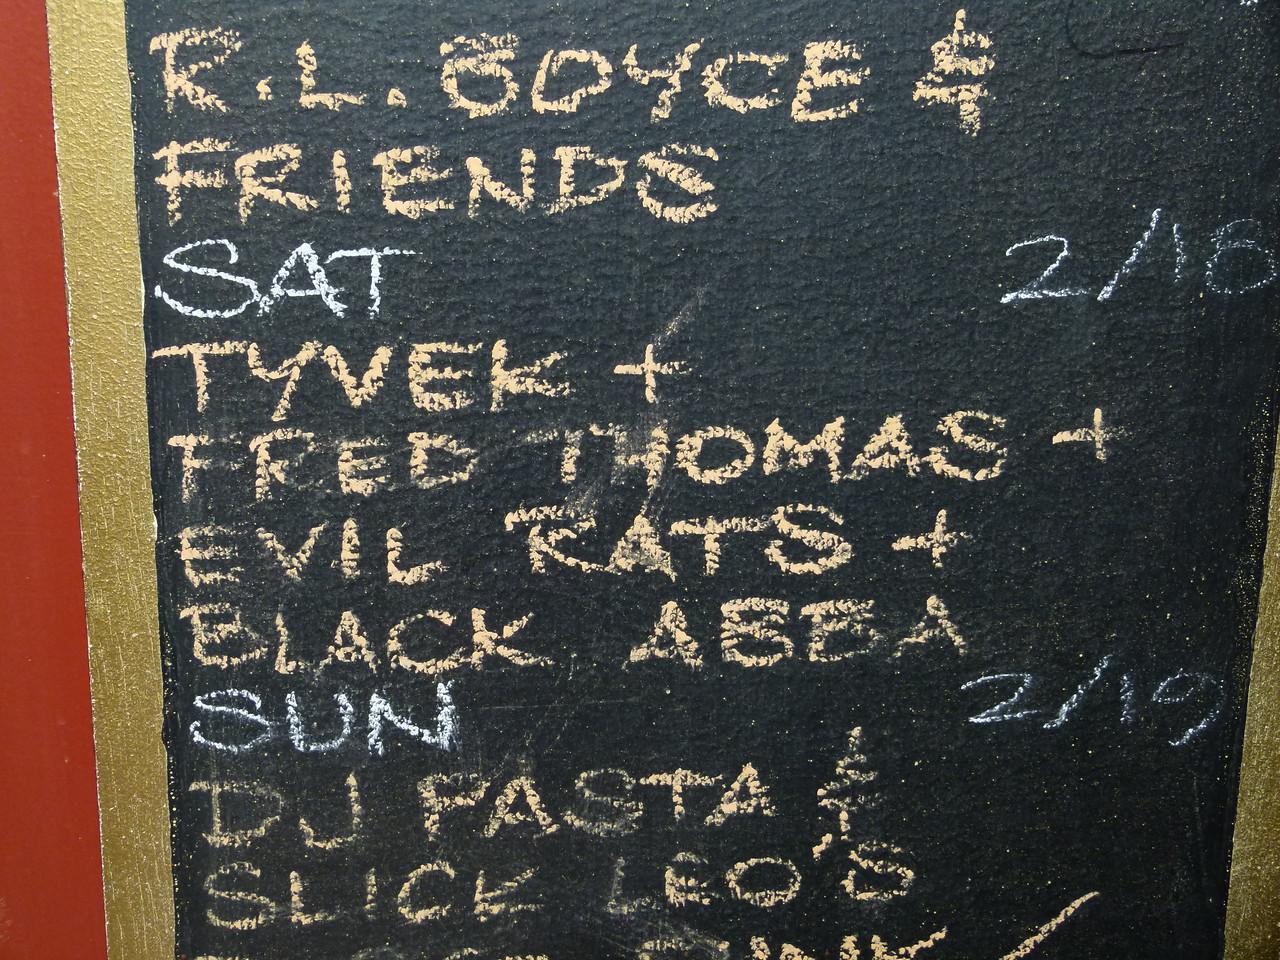 004 R. L. Boyce & Friends